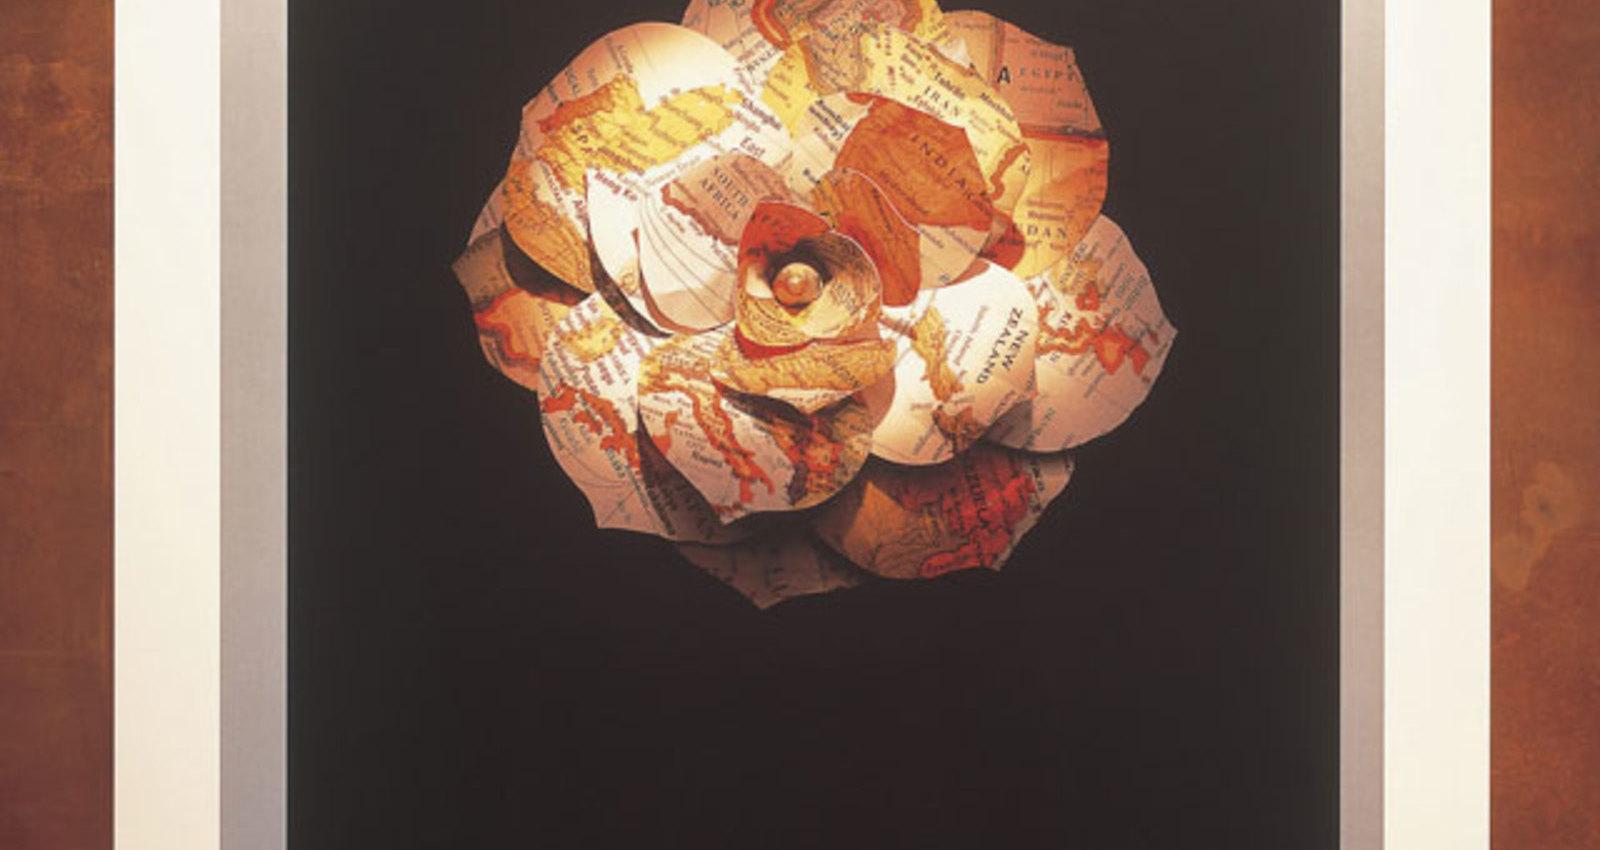 2003 NW Film Festival Poster